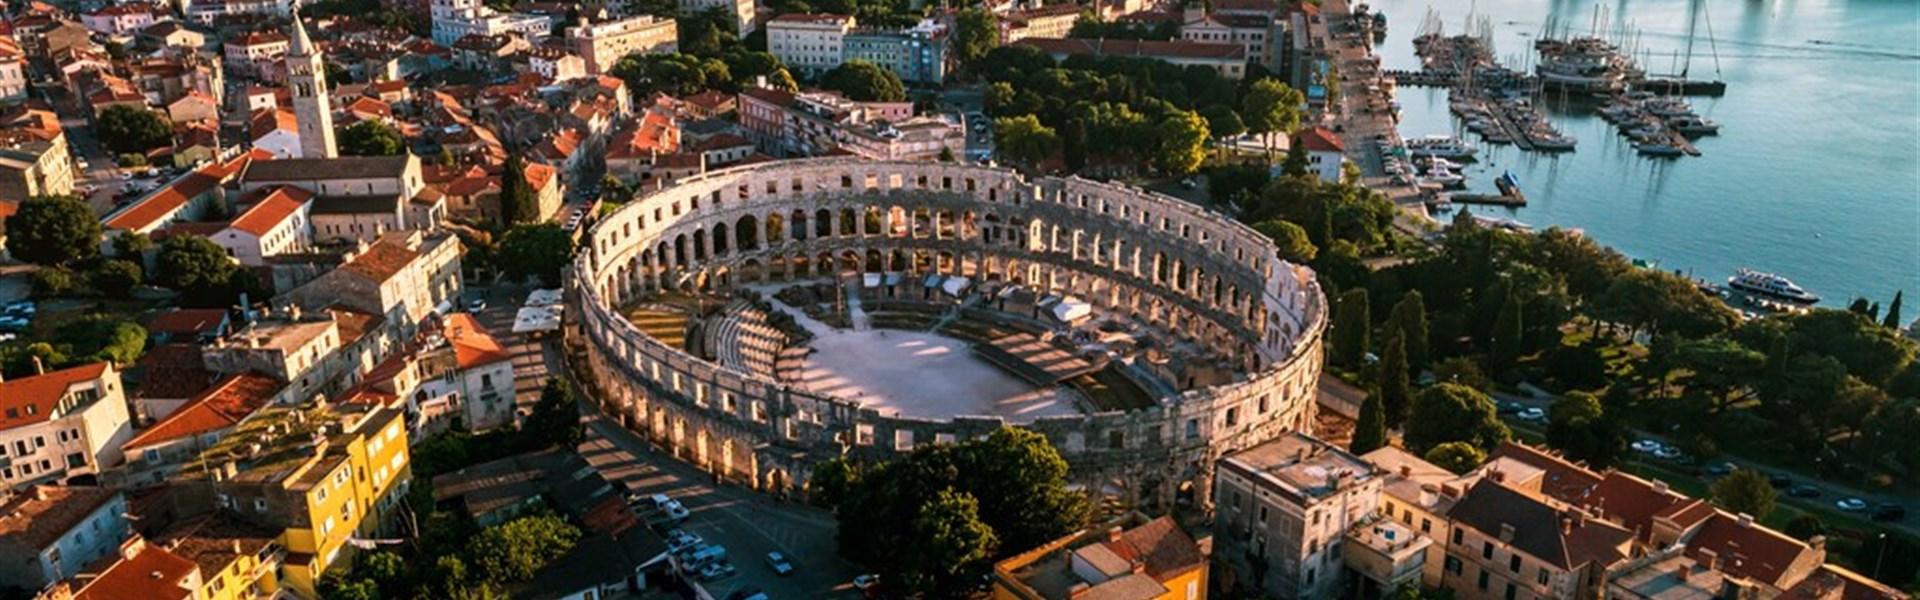 Krásy Slovinska a Istrie - 8 dní/7 nocí -